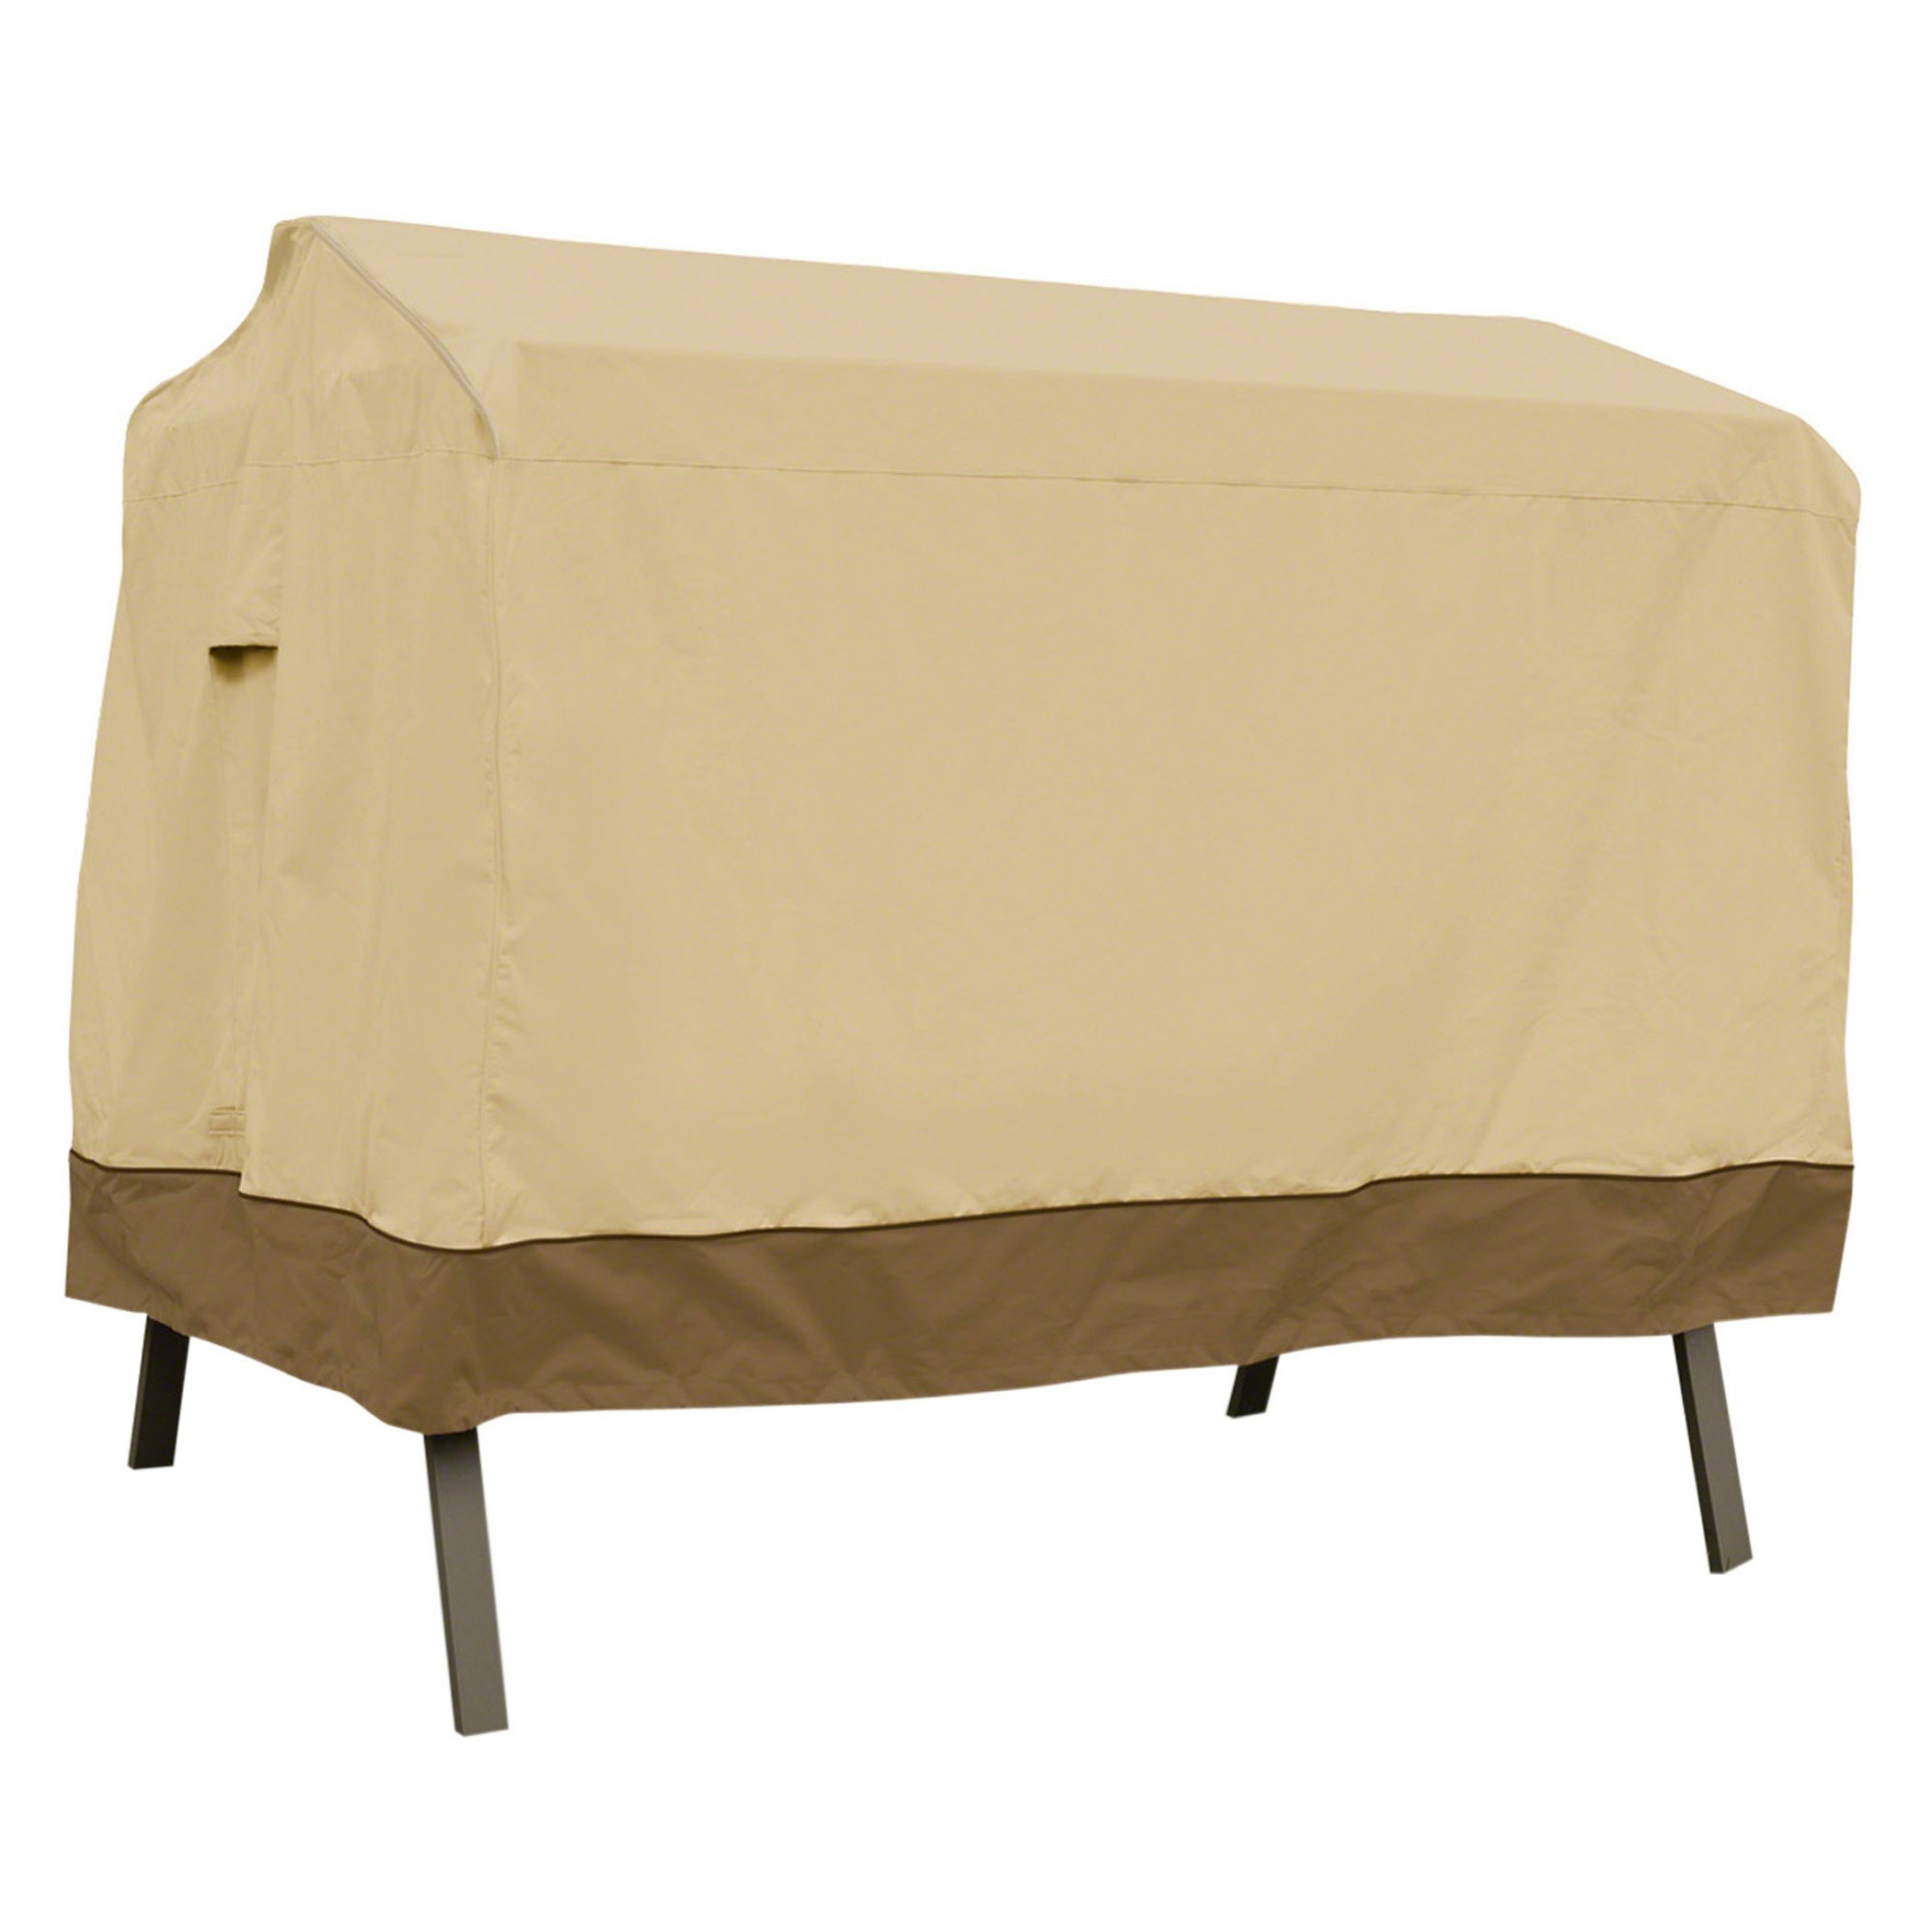 Classic Accessories Veranda 2-Seater Patio Canopy Swing Cover by Classic Accessories